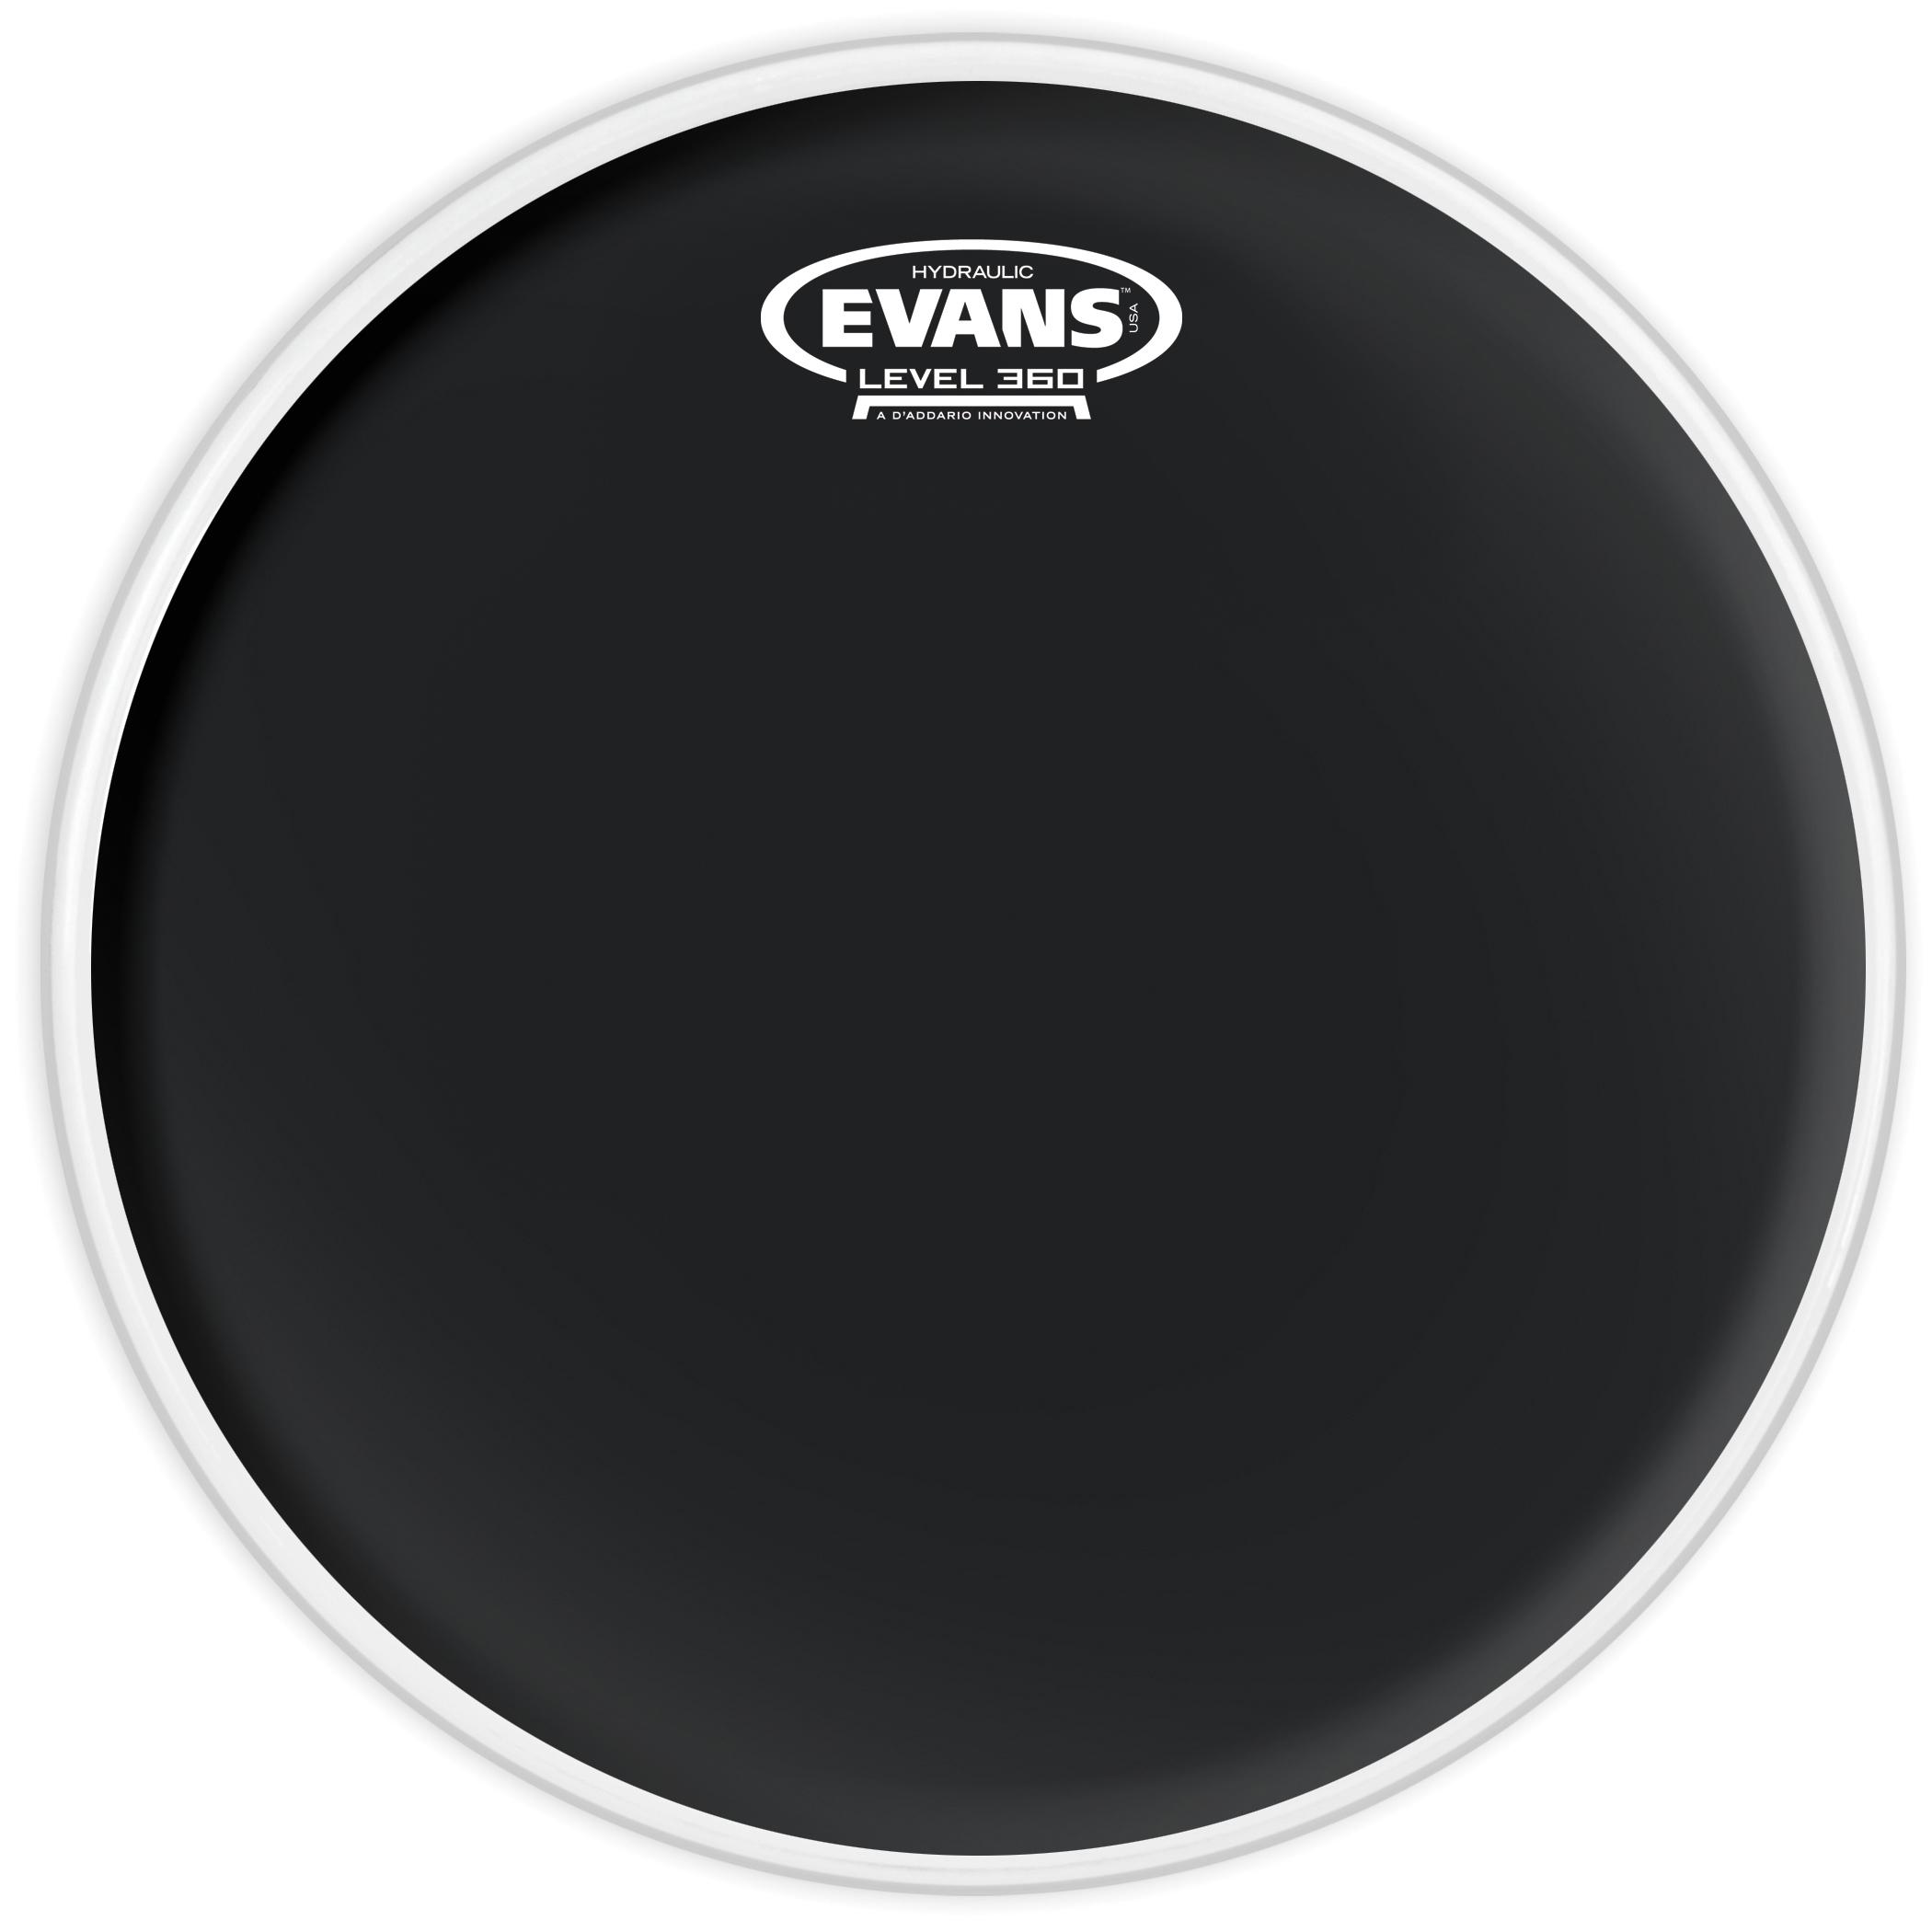 Evans Hydraulic Black Drum Head 16